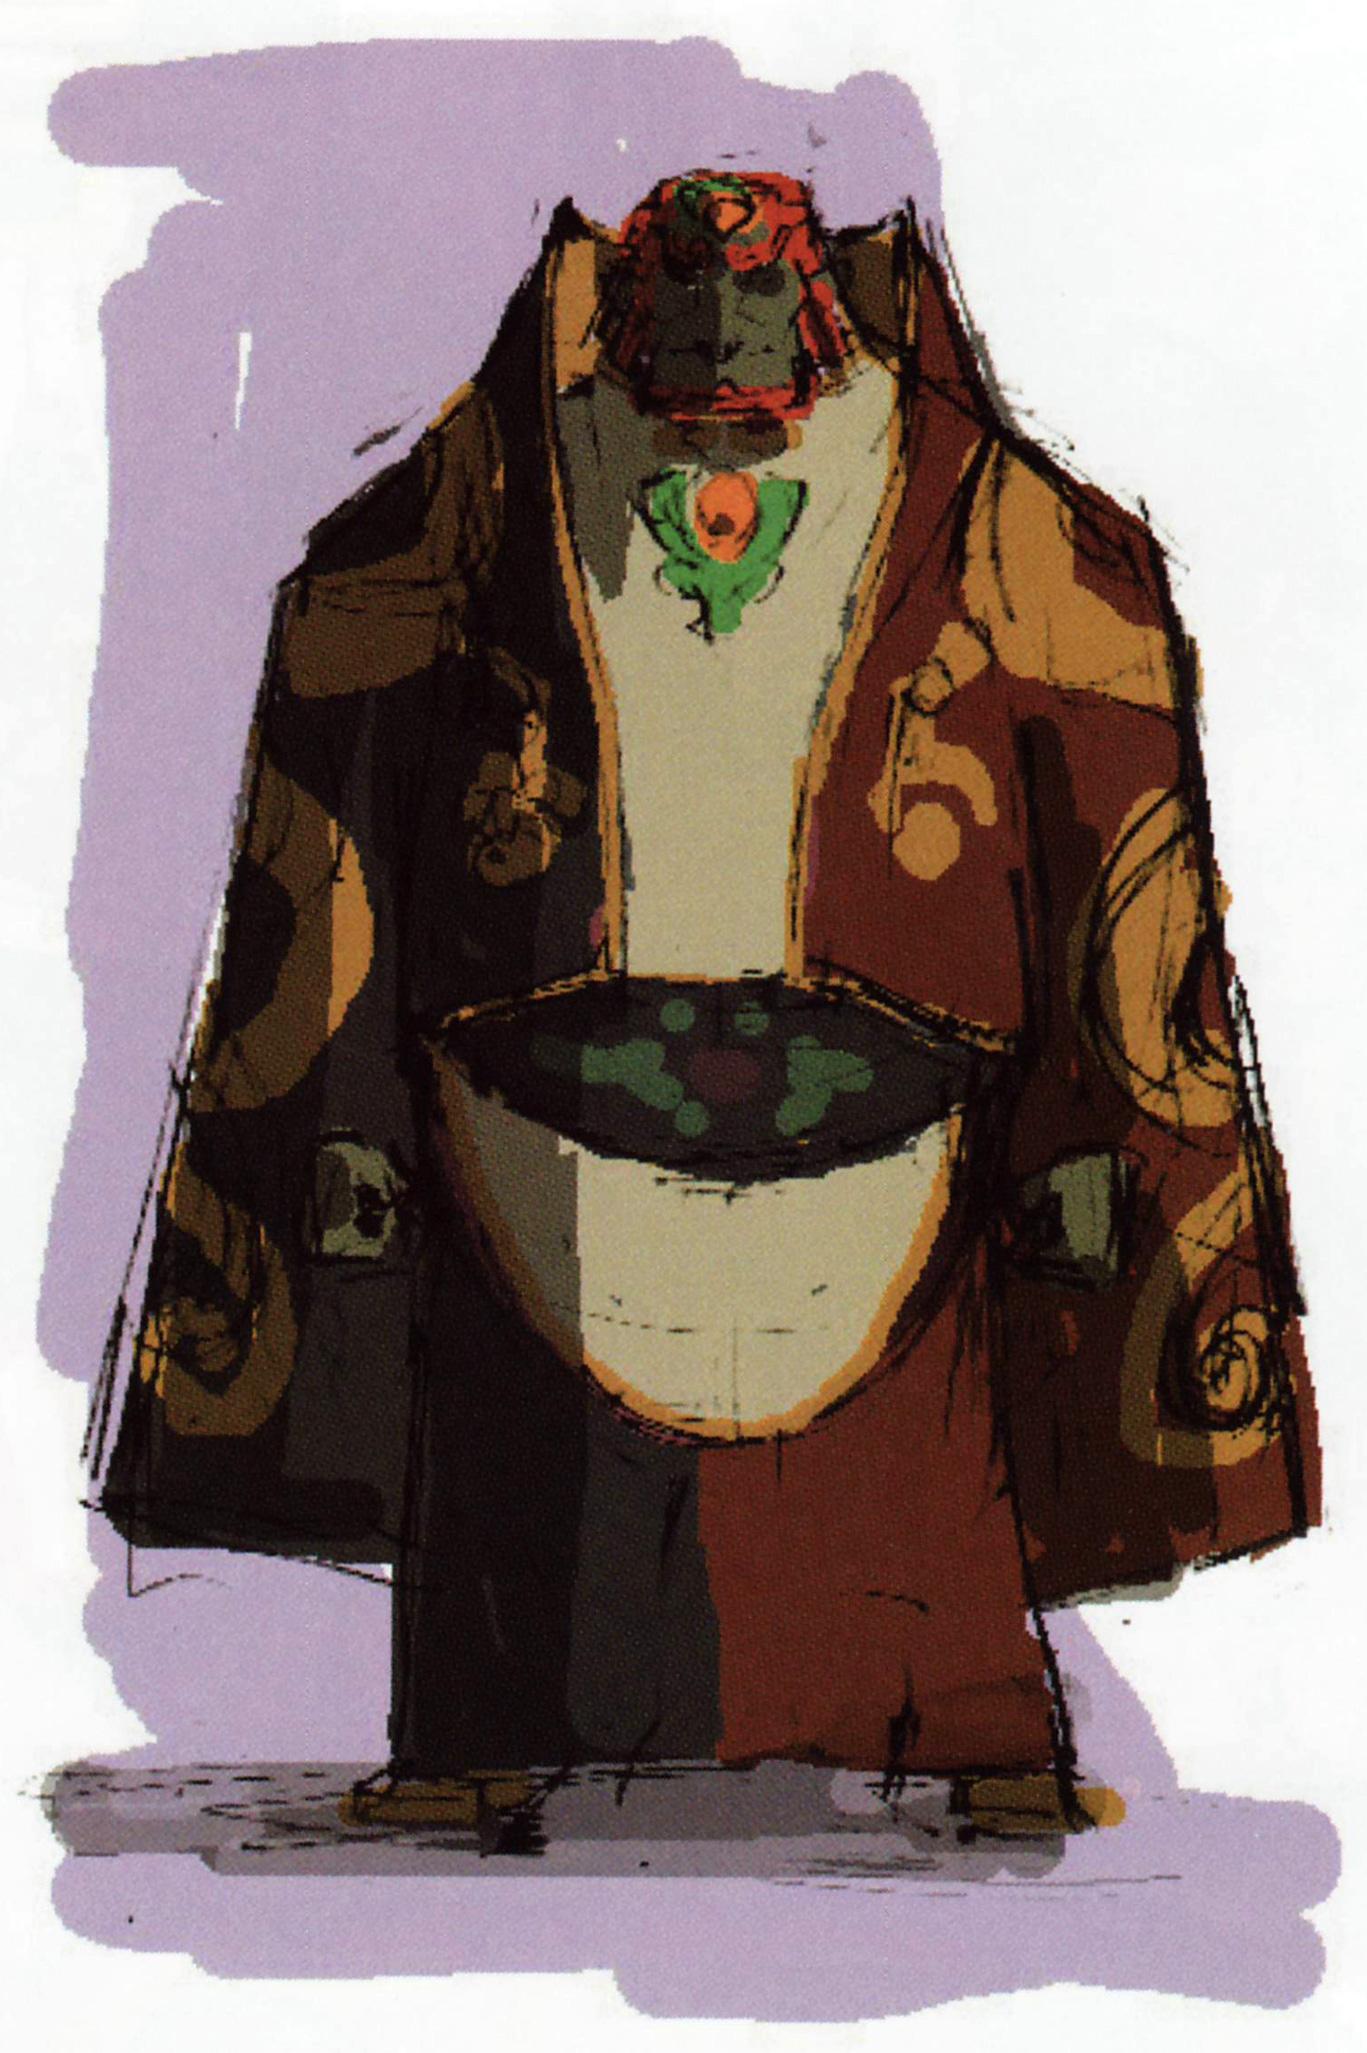 WW Ganondorf